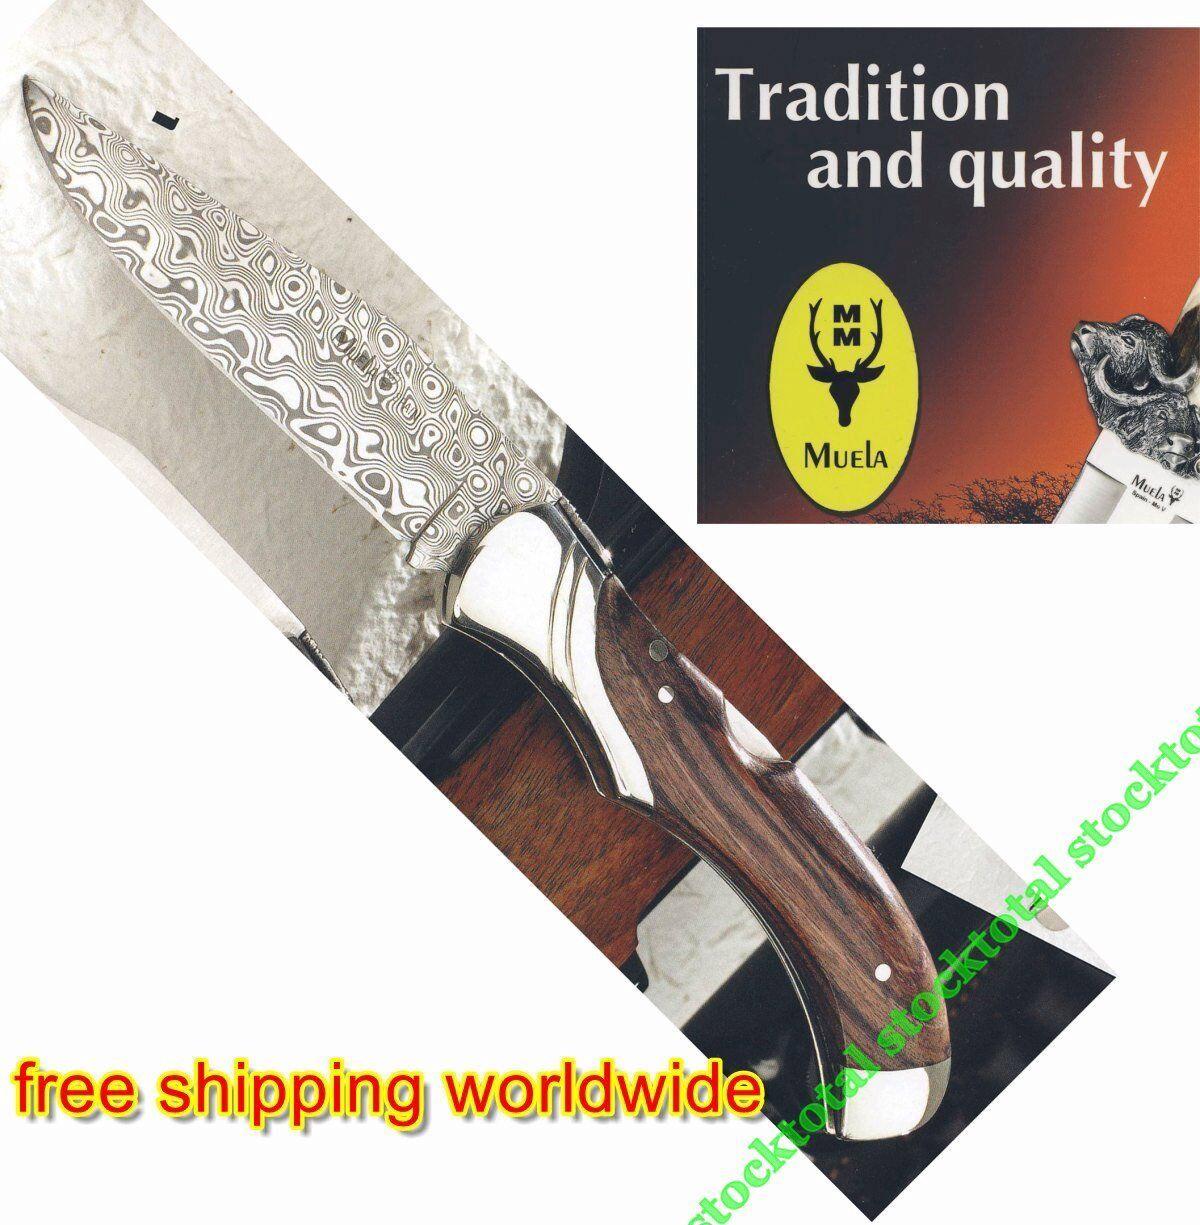 Navaja acero damasco GL-10DAM -               -free shipping worldwide -  Sin impuestos